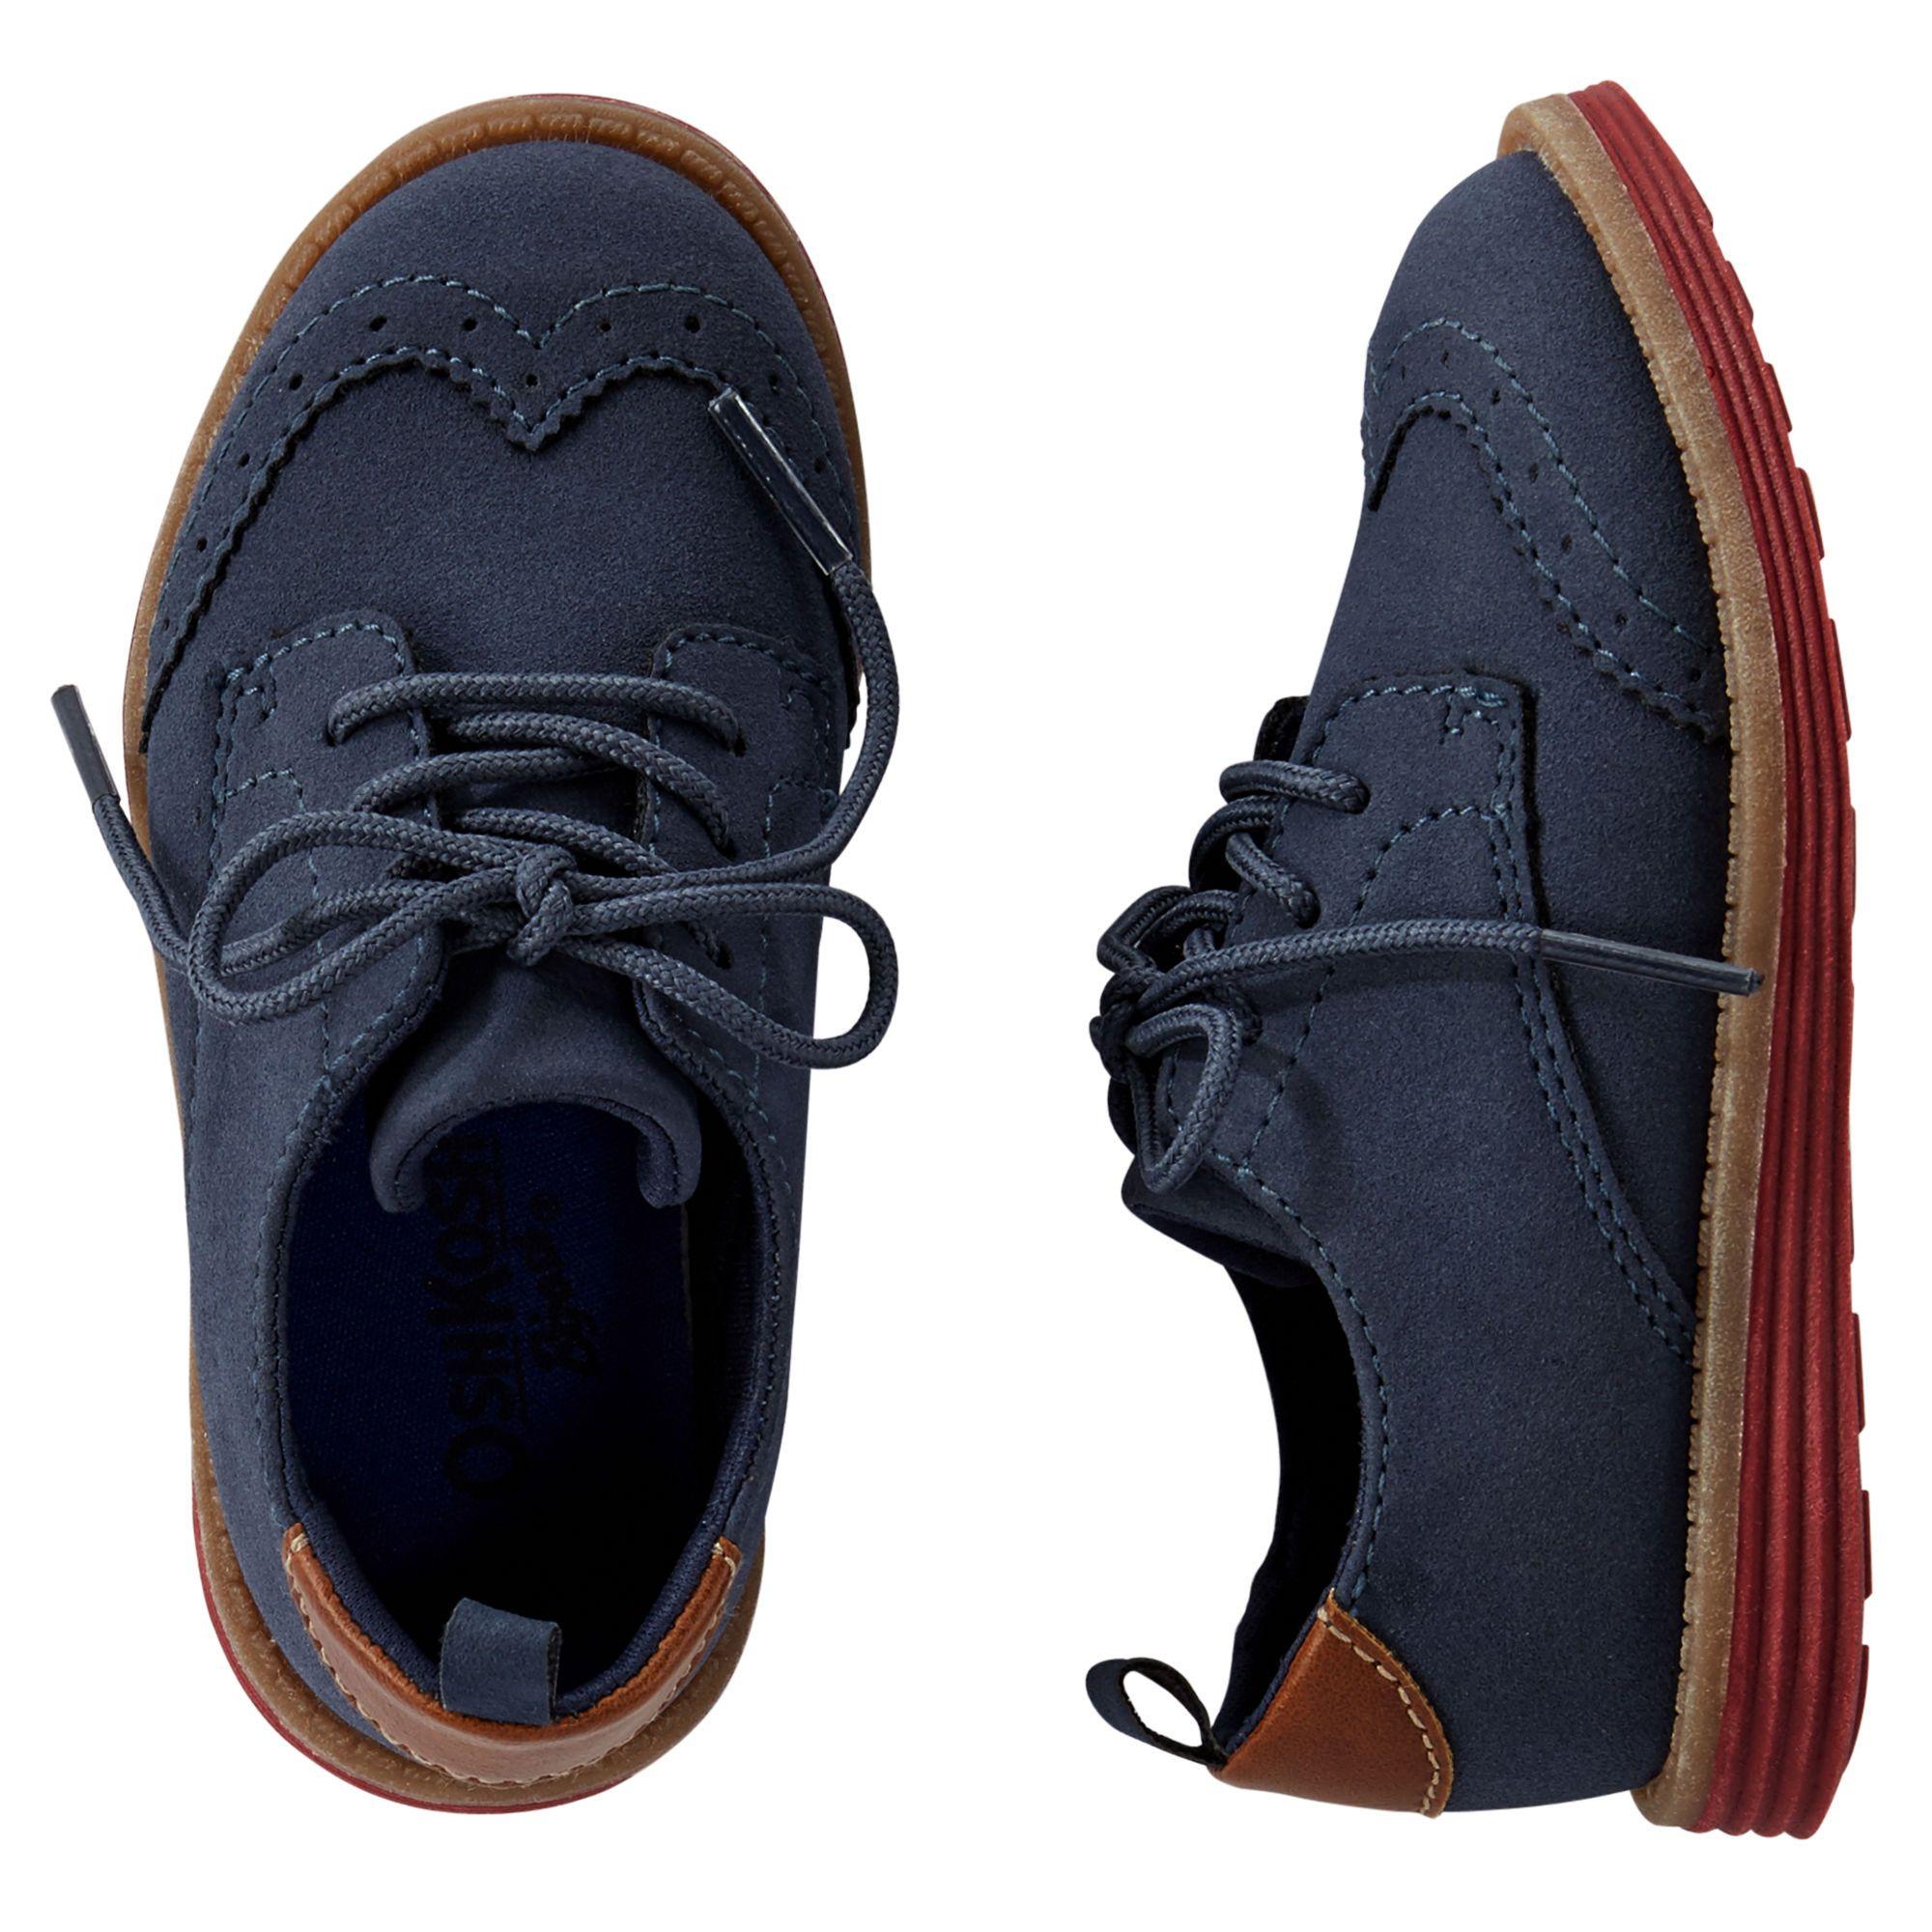 OshKosh Wingtip Oxfords | Boys dress shoes, Boy shoes, Baby boy shoes